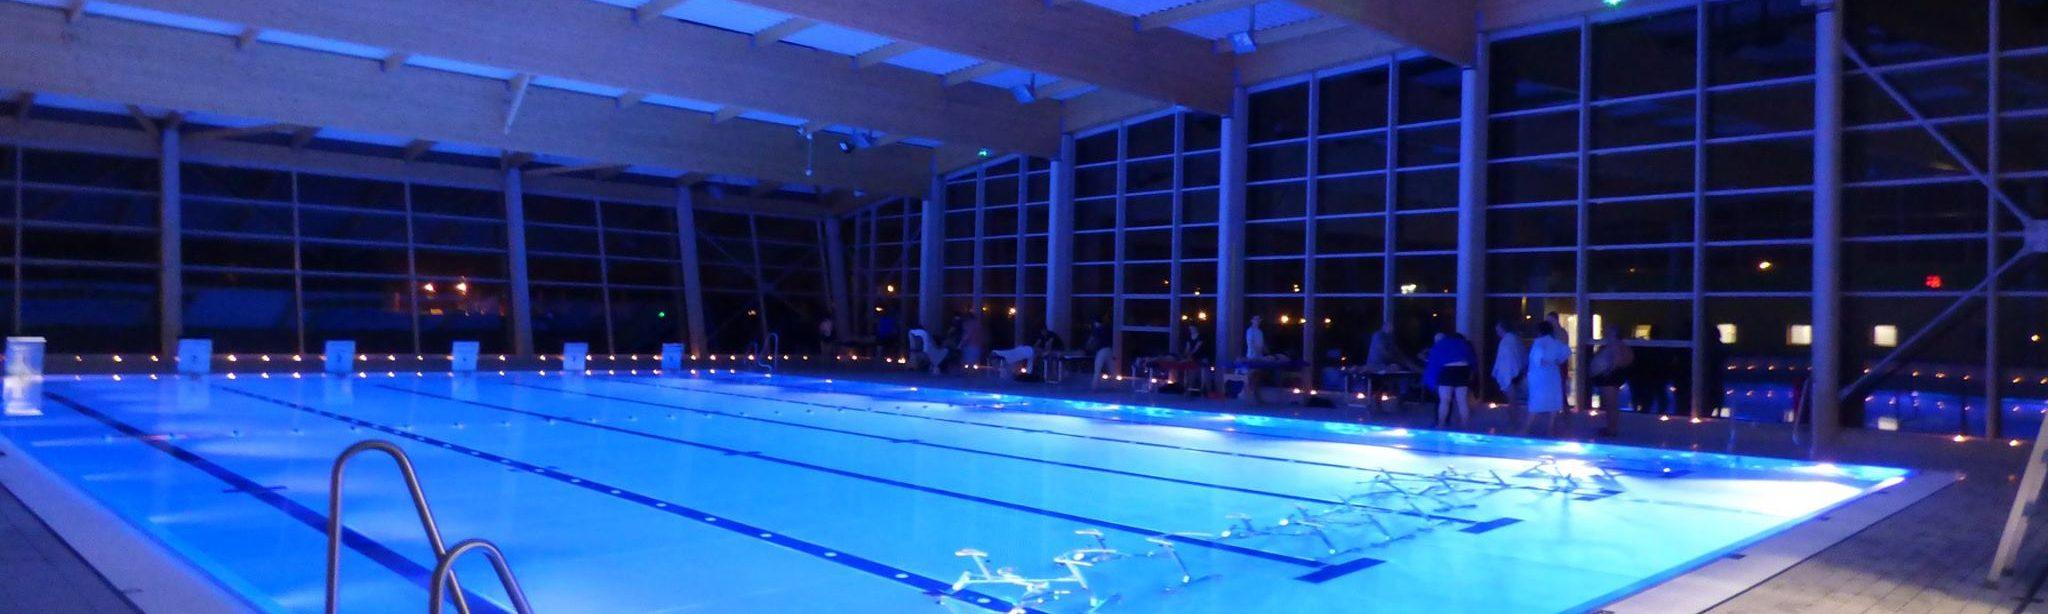 Aqualys-by-night